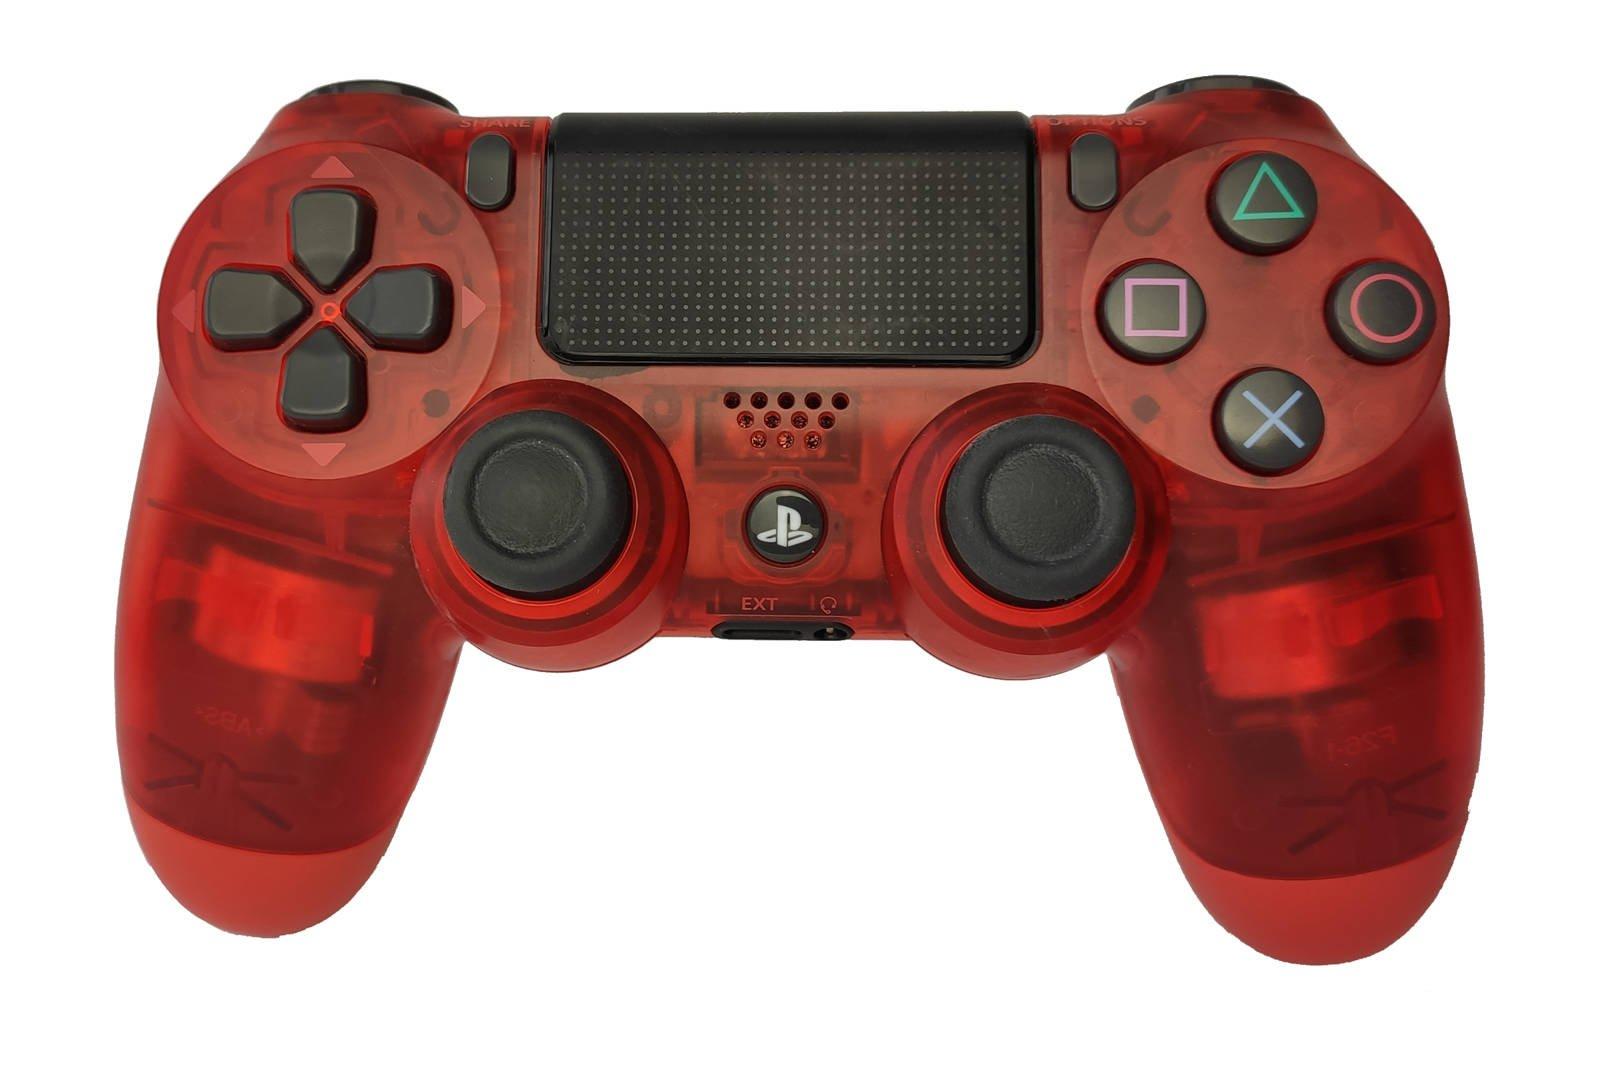 Controller Gamepad Playstation 4 PS4 v2 Red Crystal